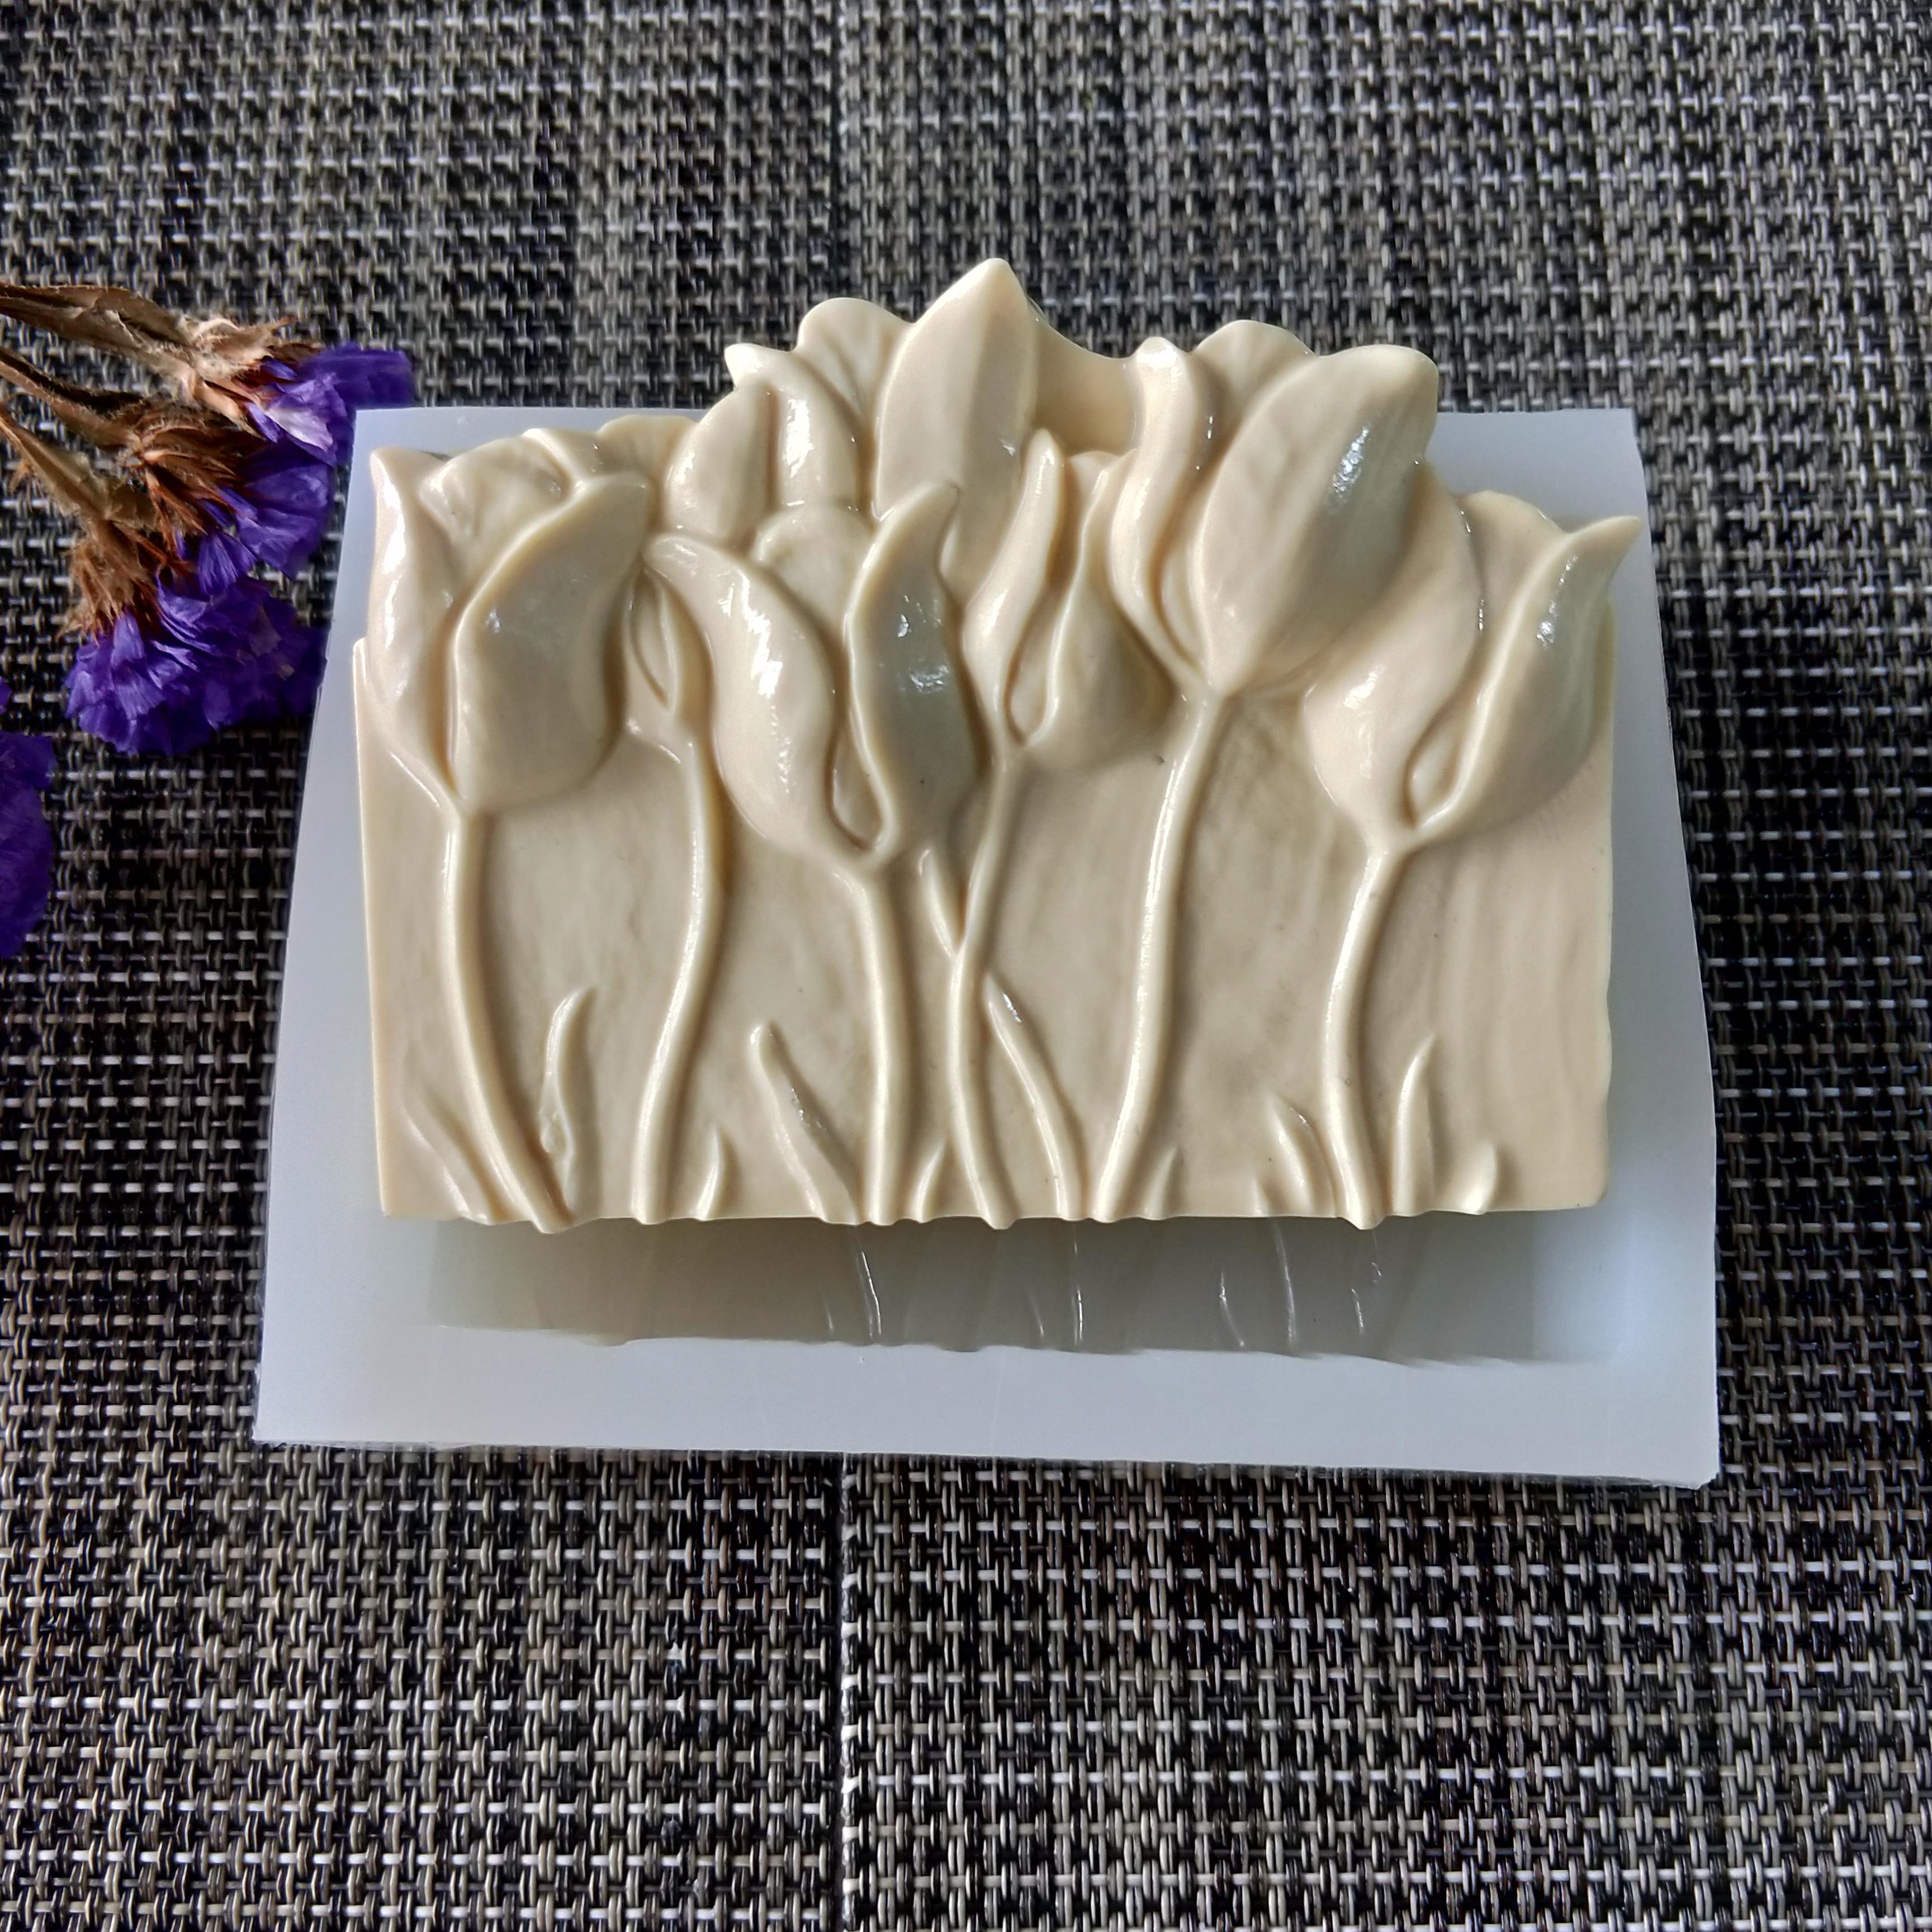 PRZY Mehrere tulip blumen silikon form seife blume handgemachte seife mold kerze silikon form DIY handgemachte seife form